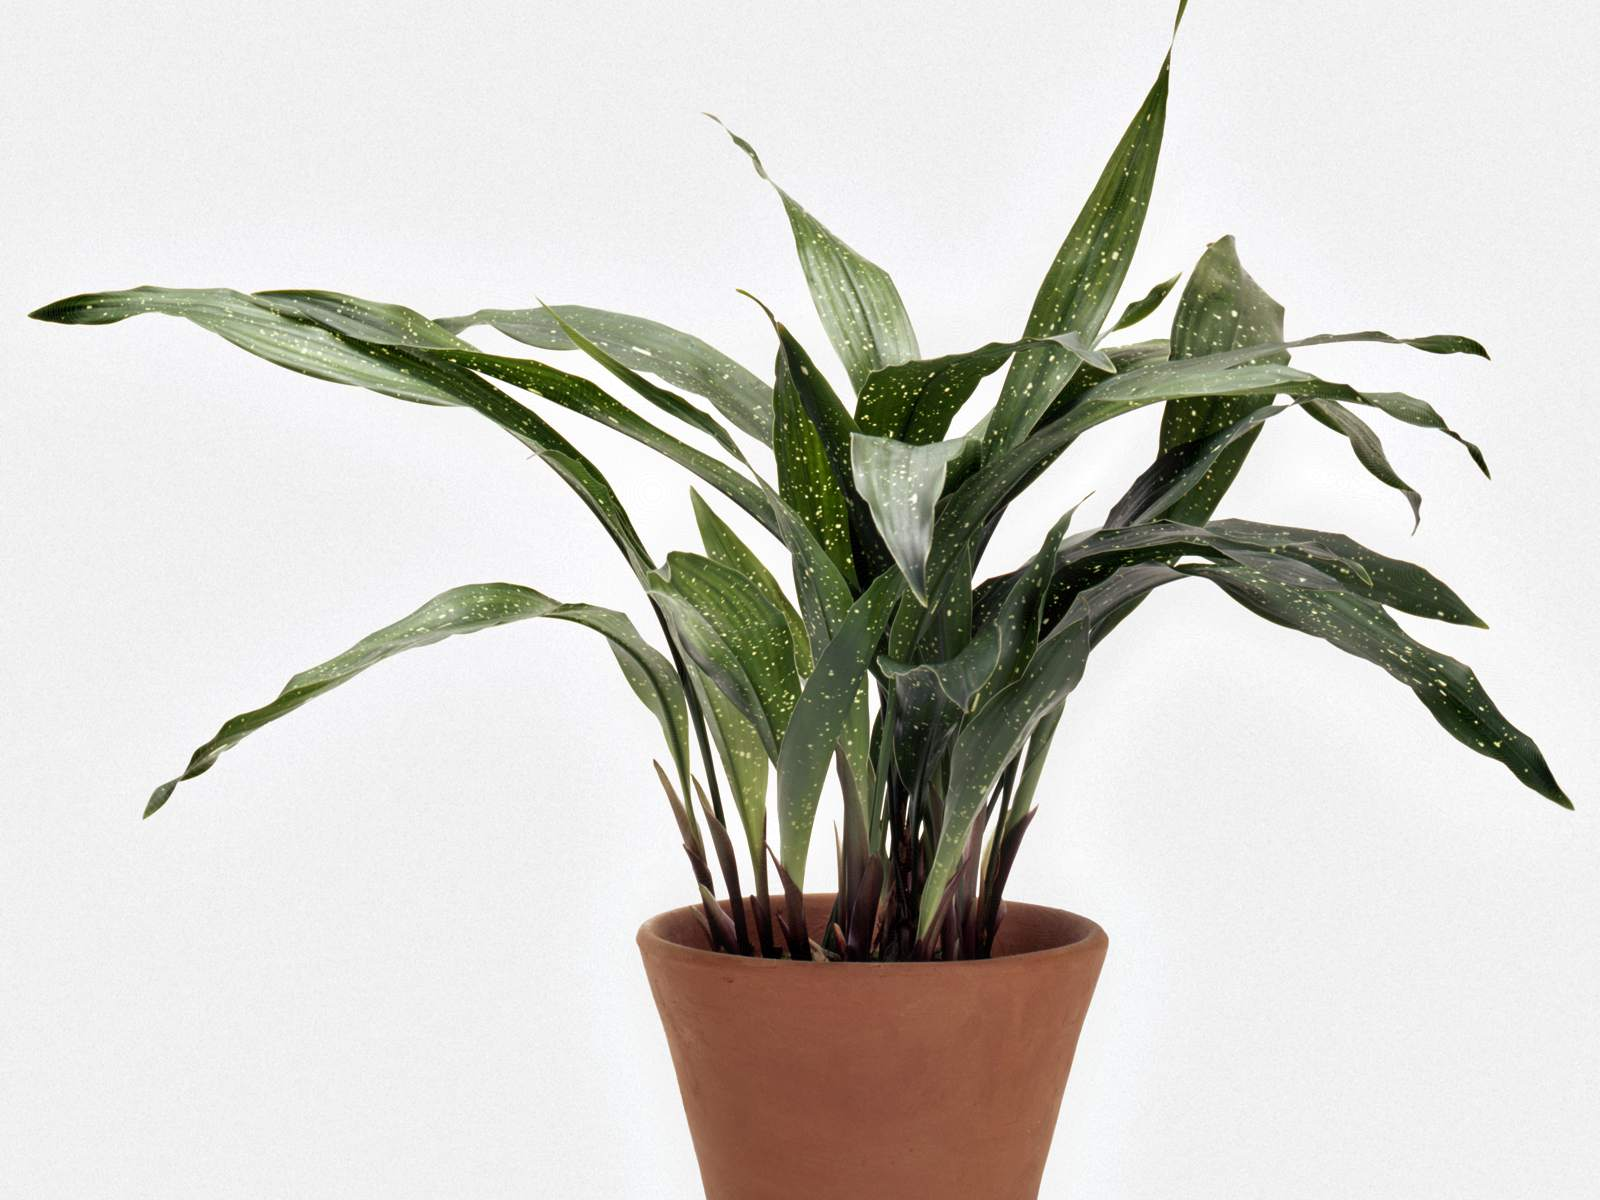 Cast Iron Plant (Aspidistra relation)